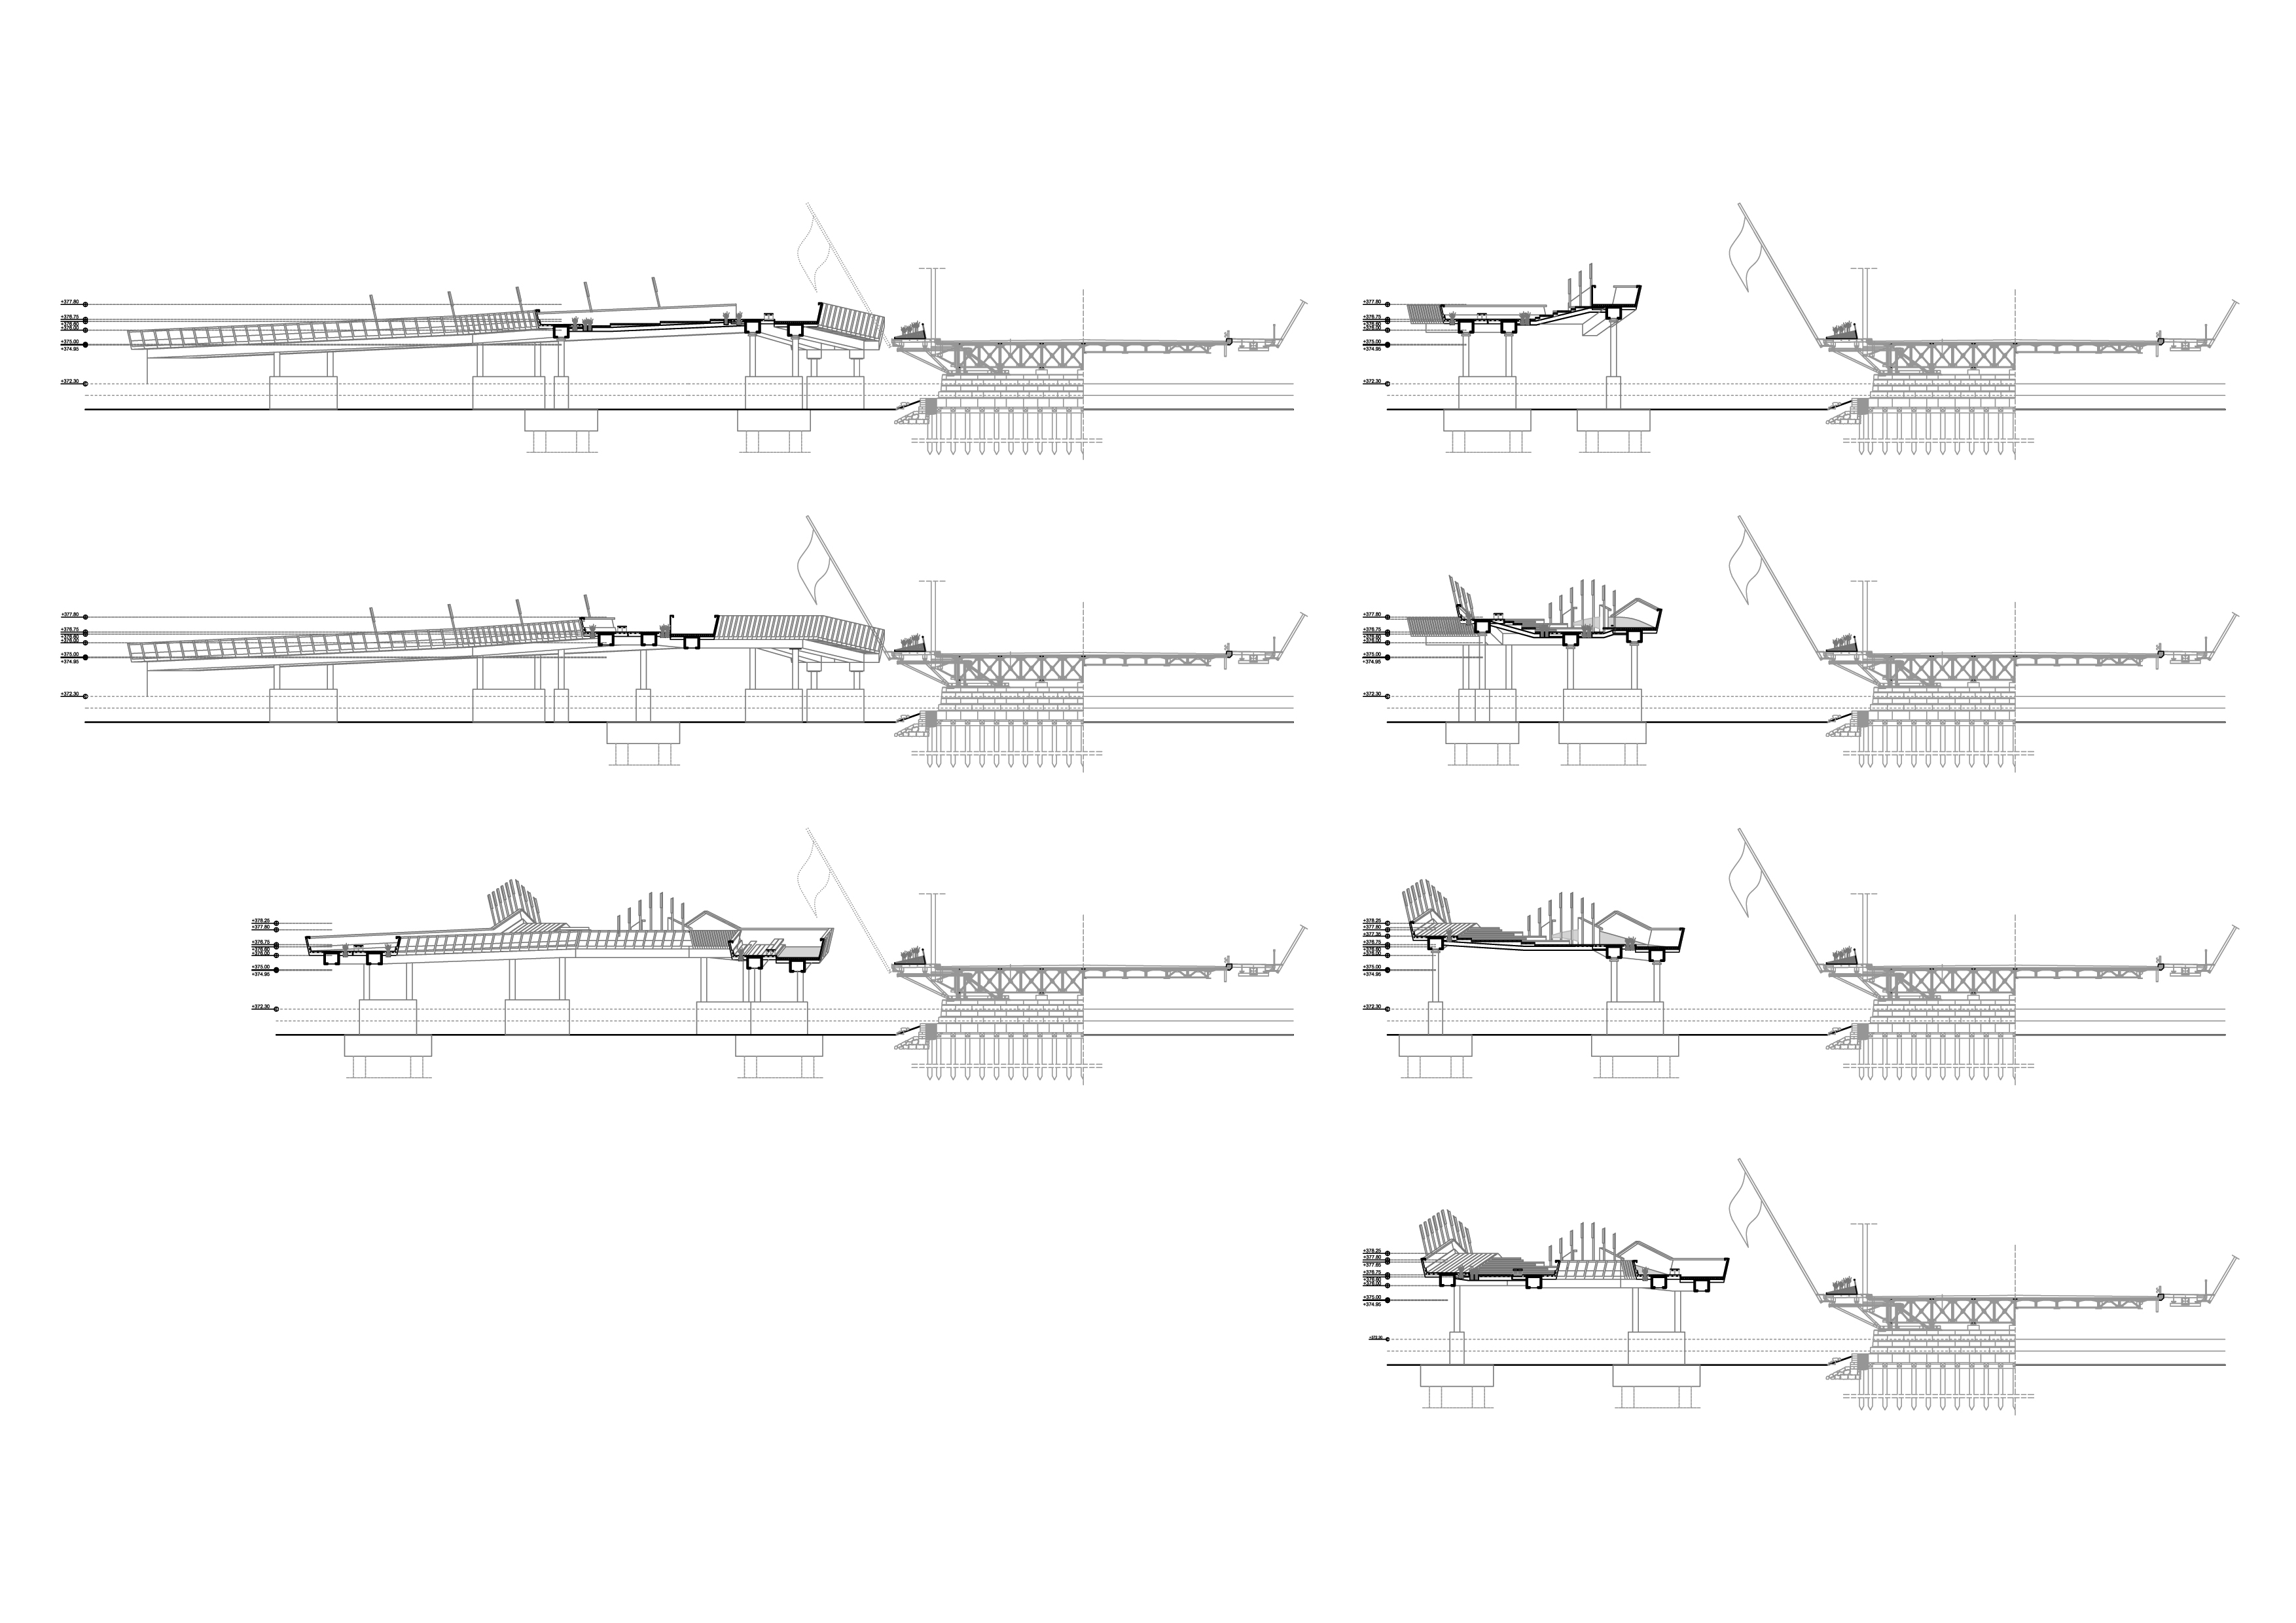 Sala Ferusic Architects Laps-de-temps Carles Sala Relja Ferusic